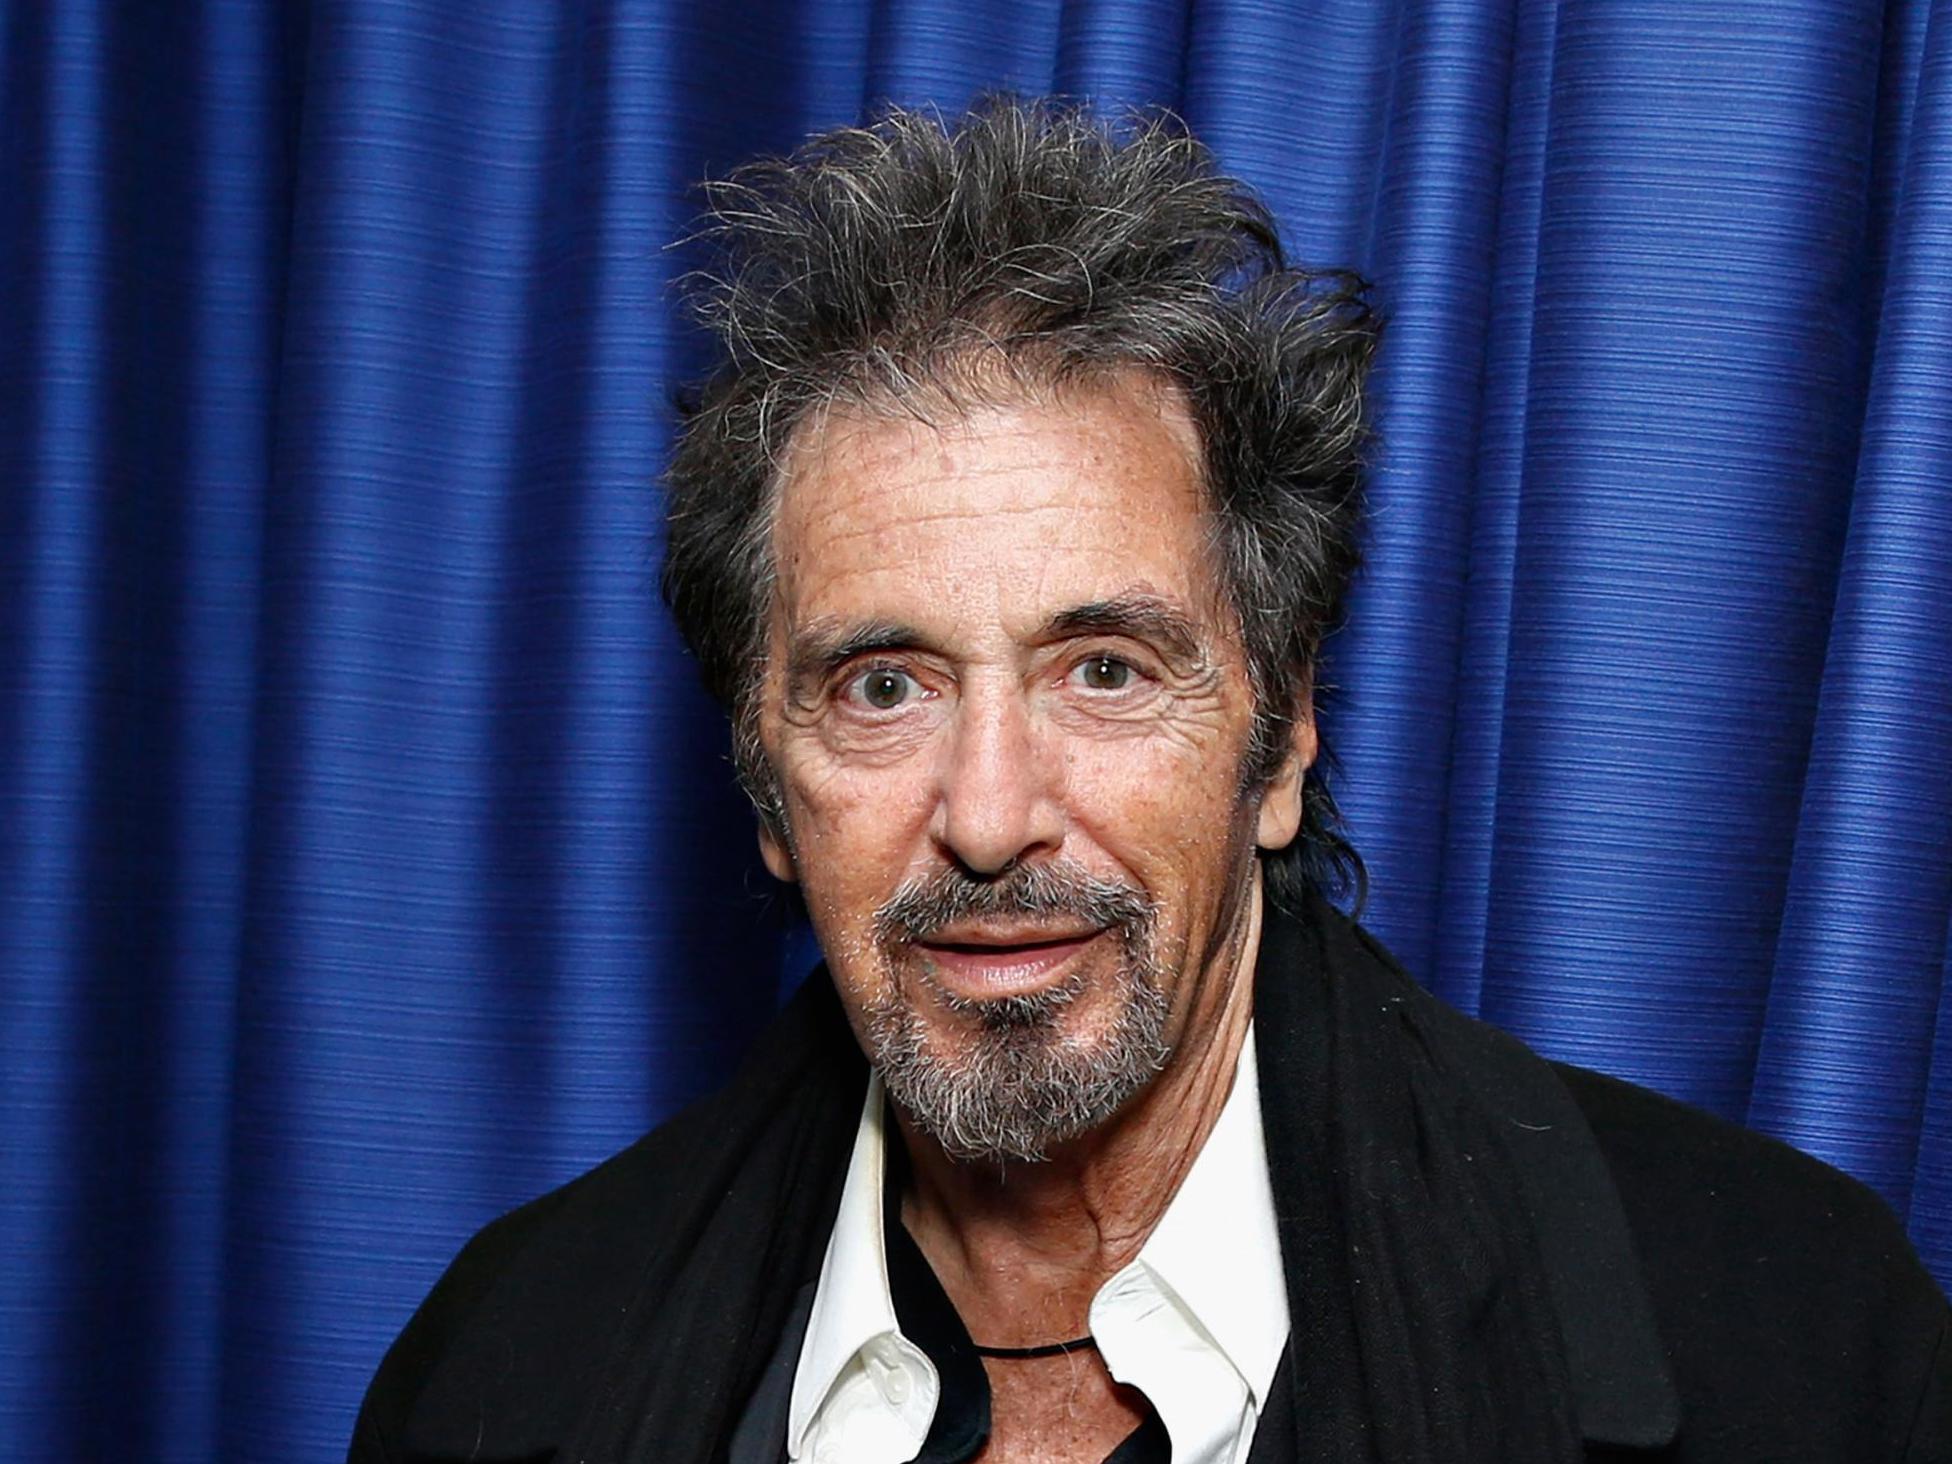 The Irishman star Al Pacino says he would use de-ageing tech to star in Michael Mann's Heat prequel